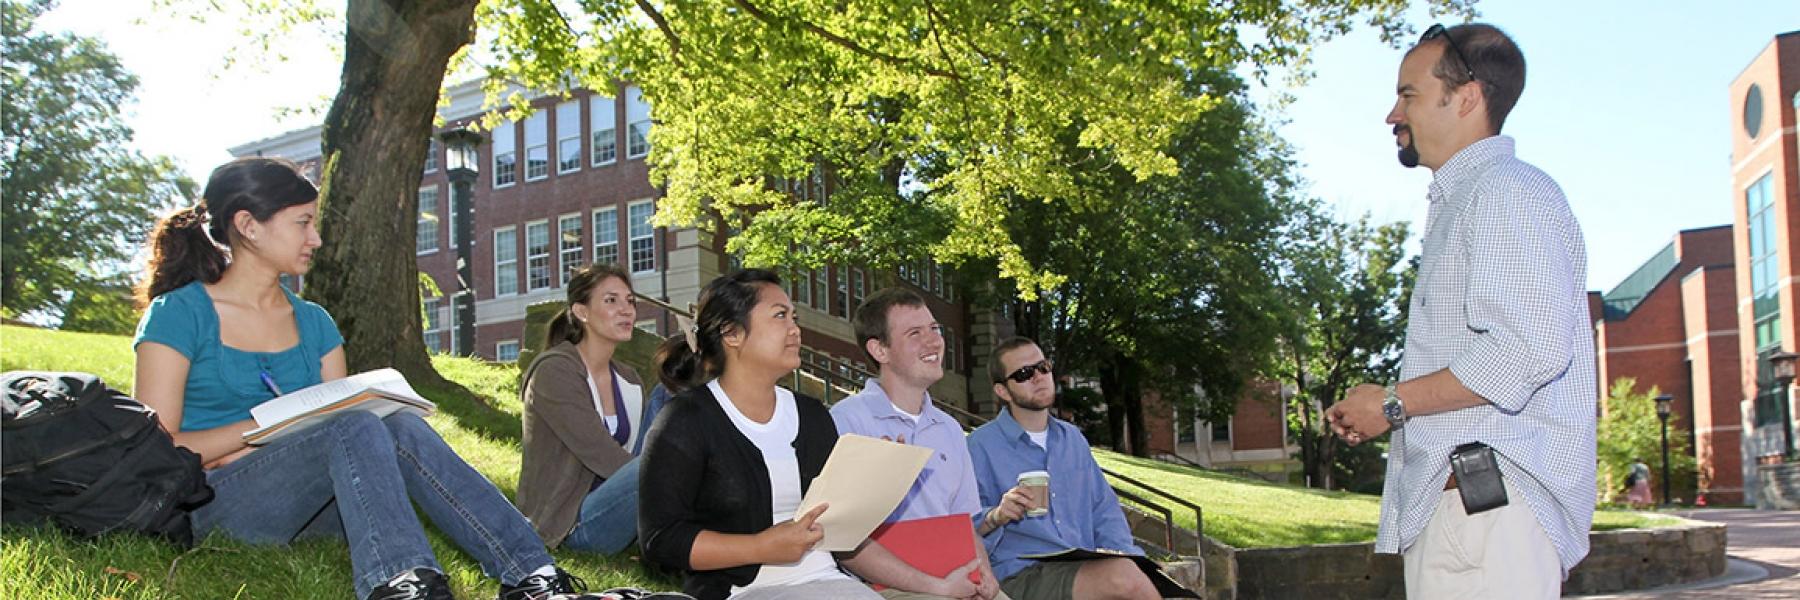 Outdoor classroom at ASU